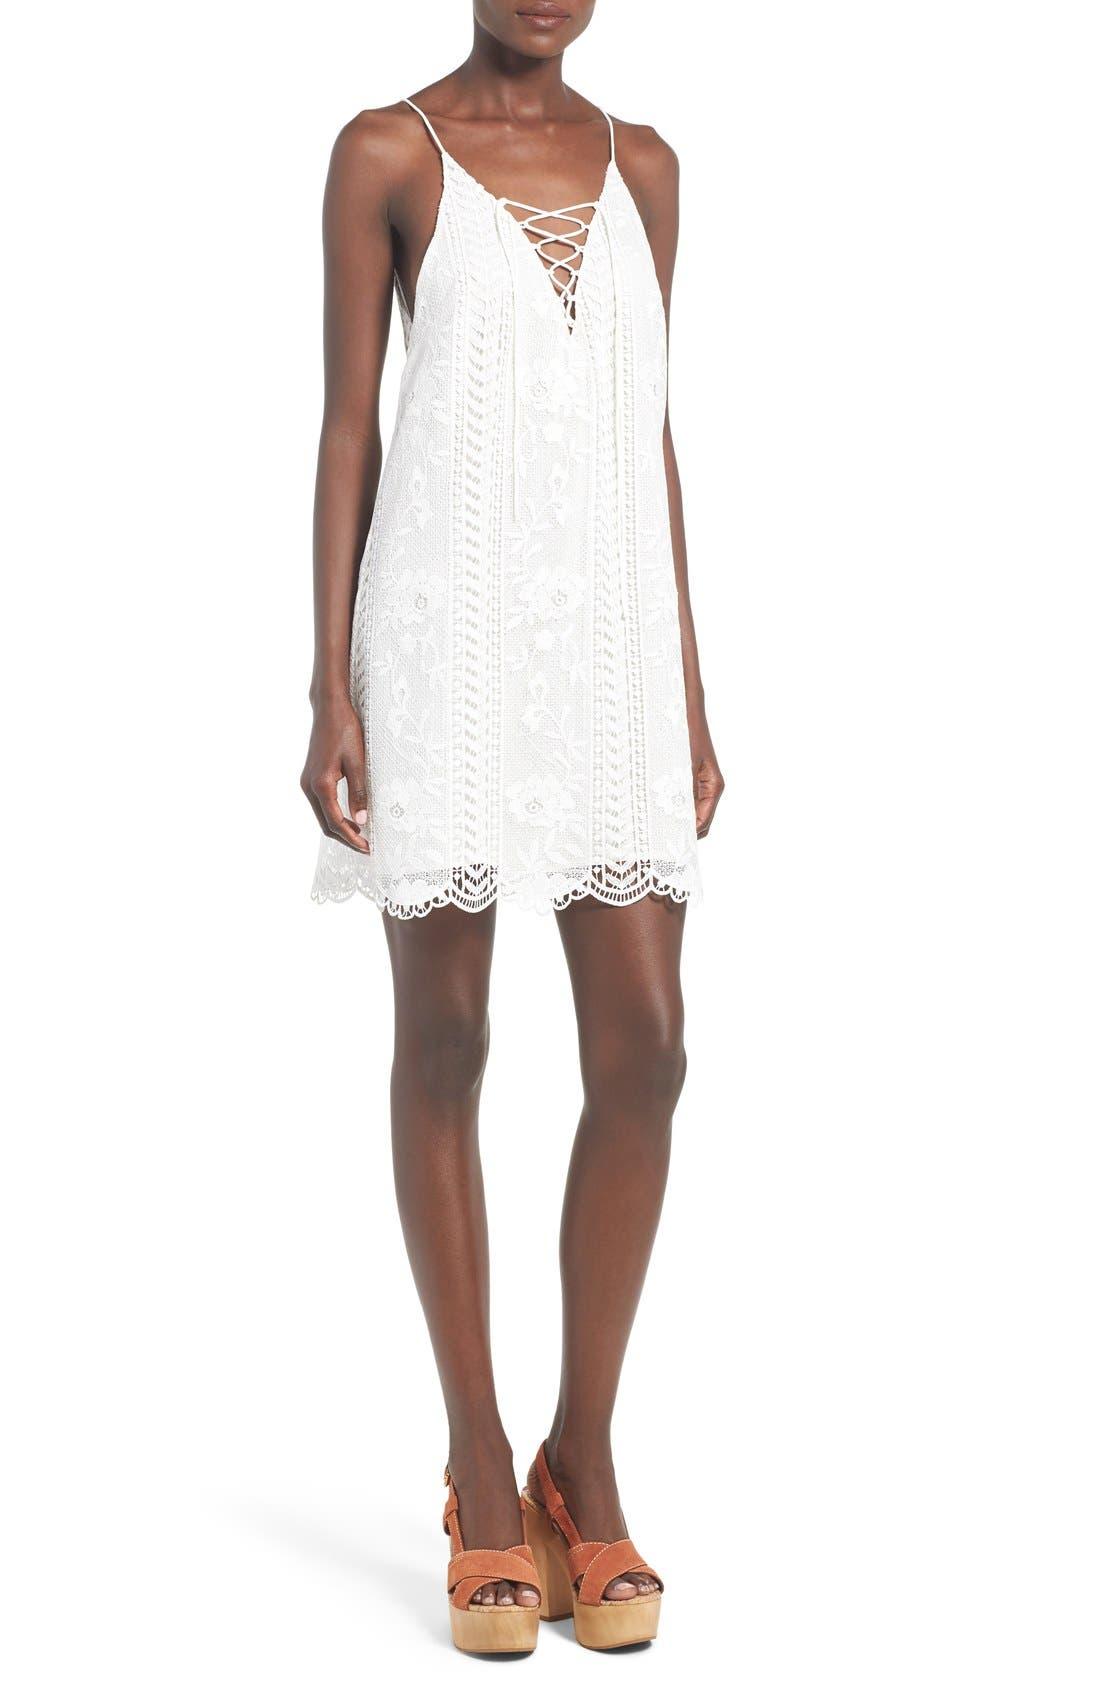 Main Image - ASTR Lace-Up Shift Dress